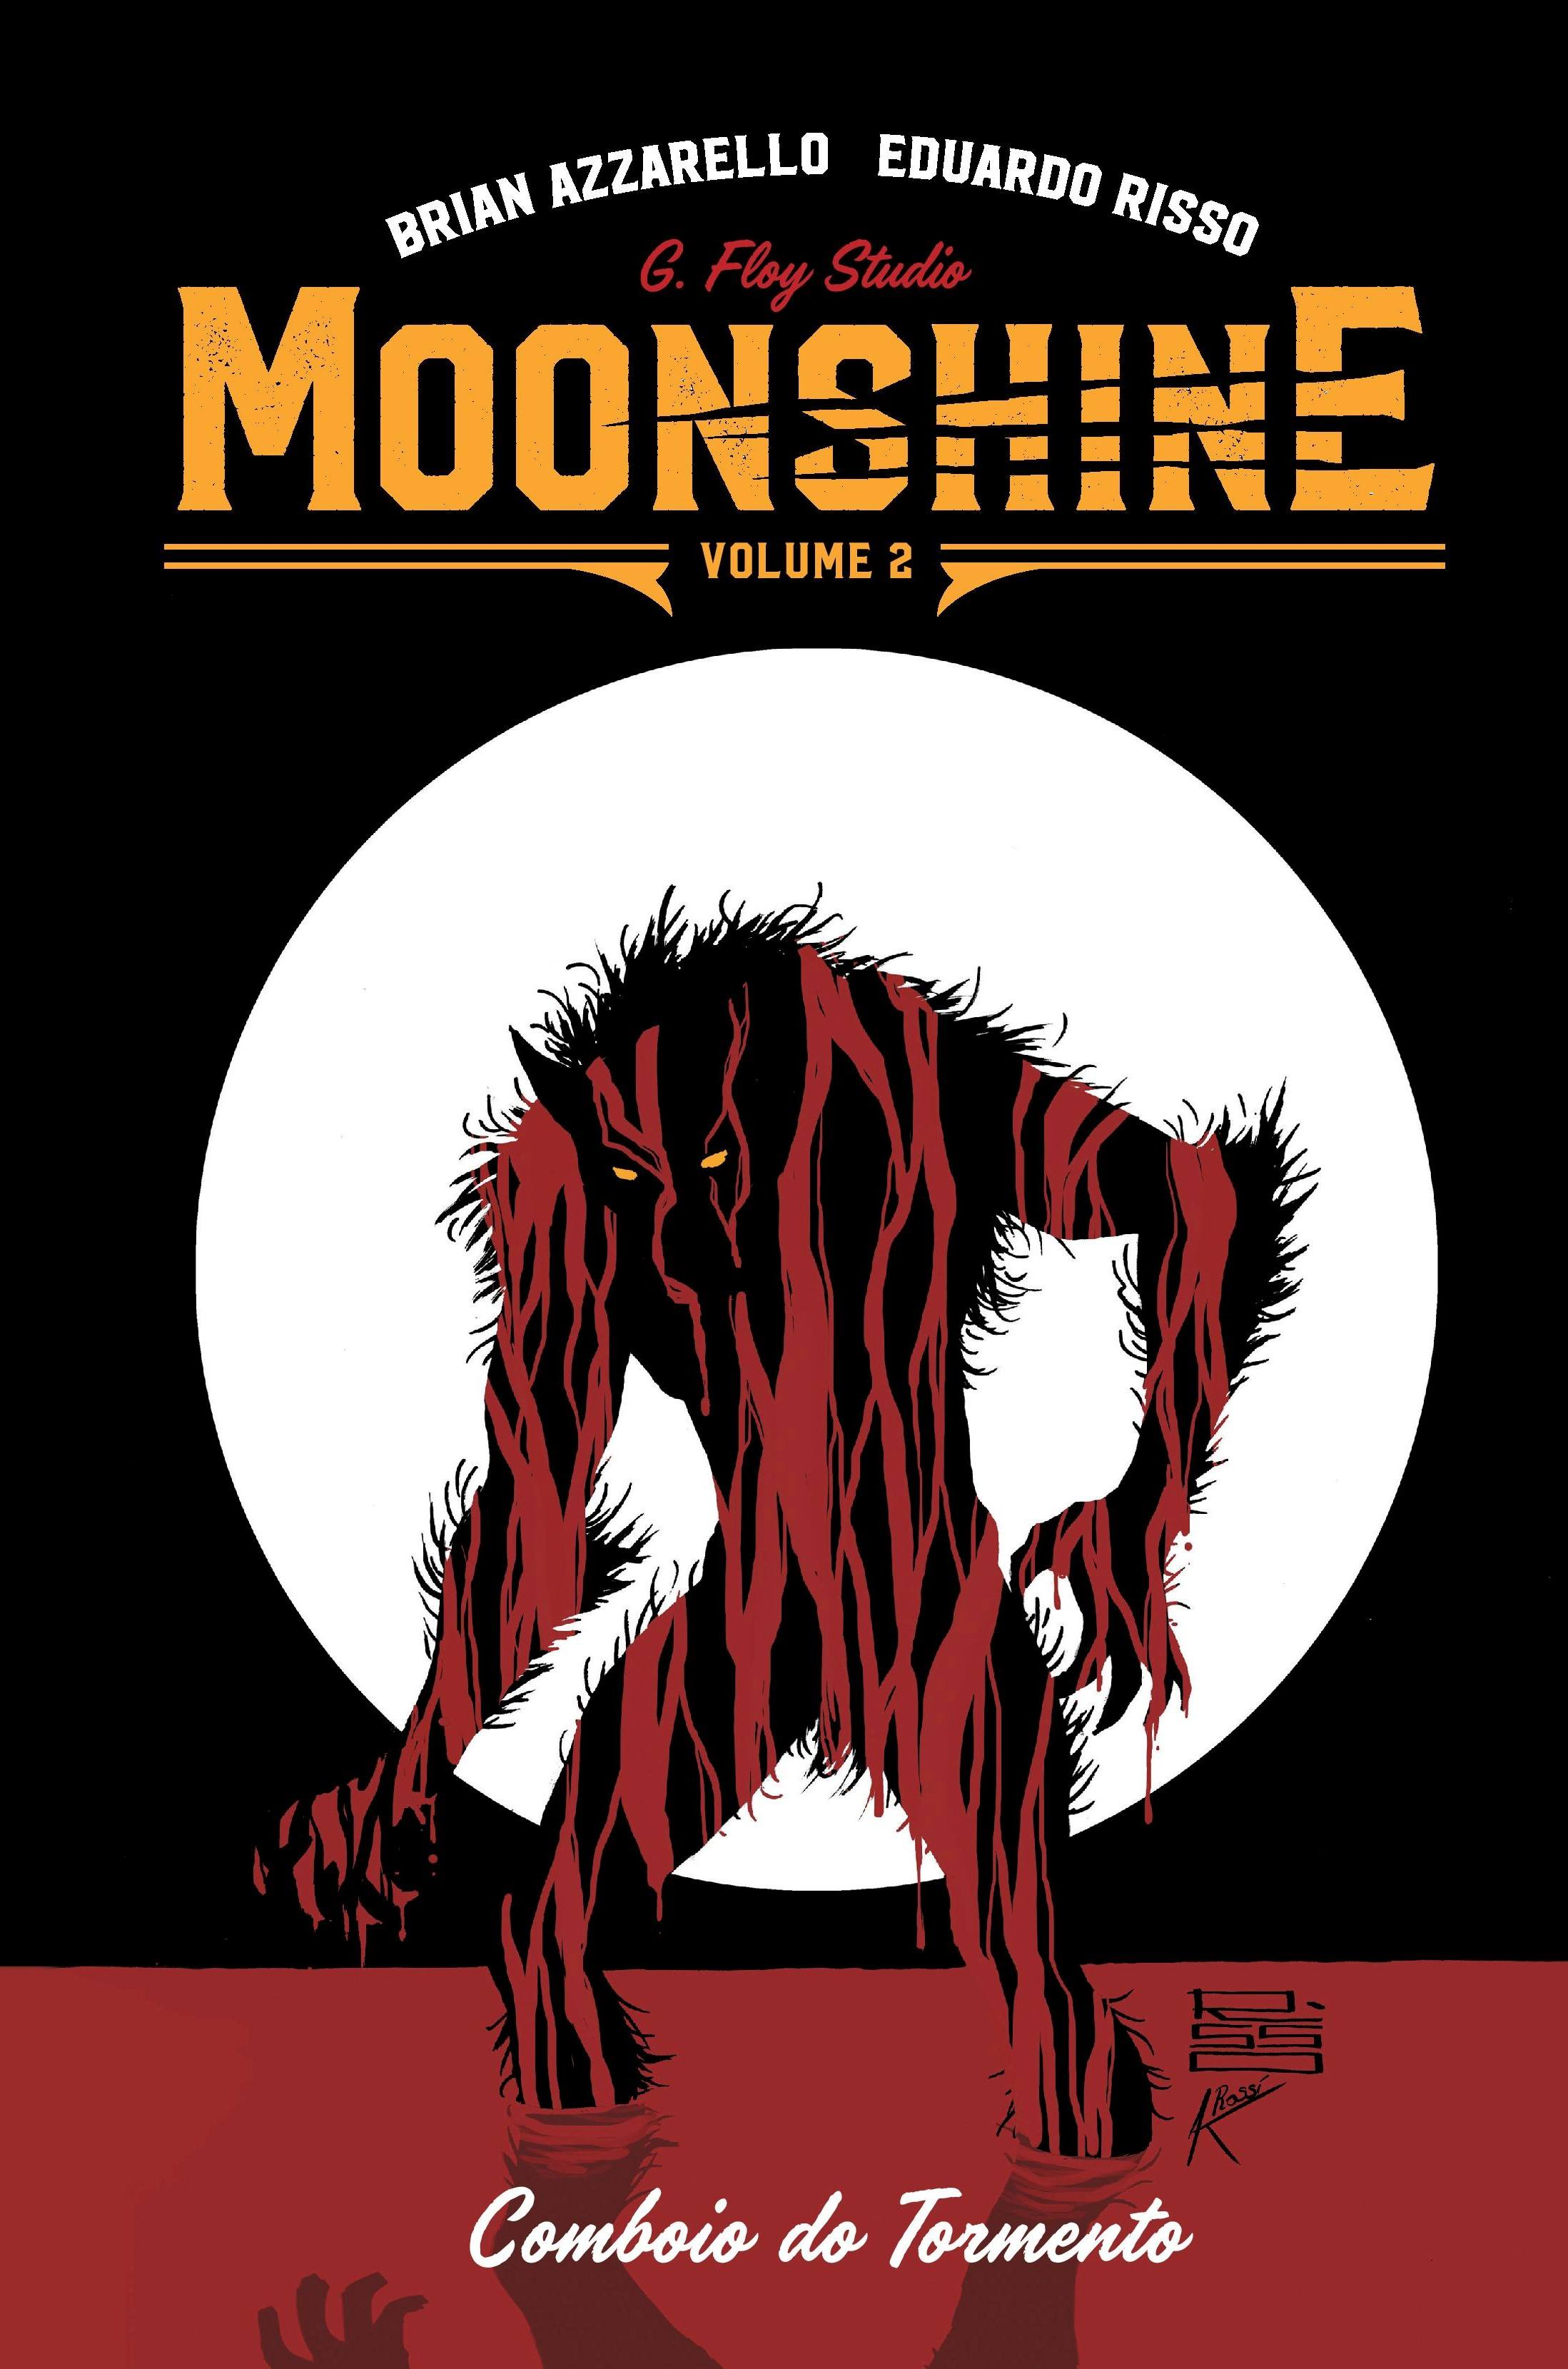 MOONSHINE vol. 2: Comboio do Tormento